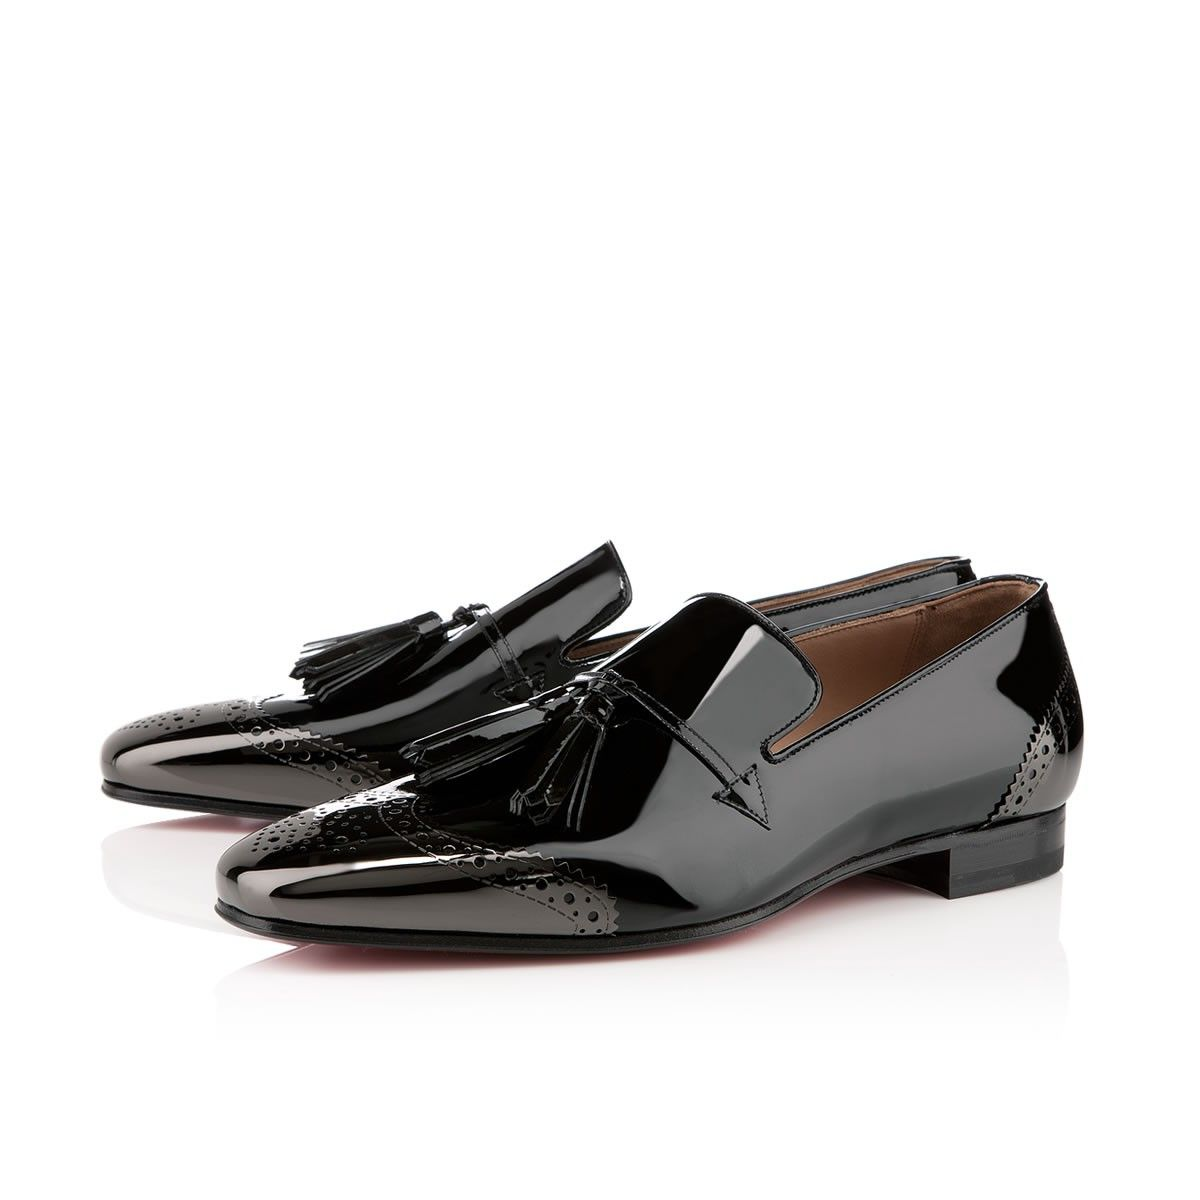 James Men's Flat Black Patent Leather, Christian Louboutin ...